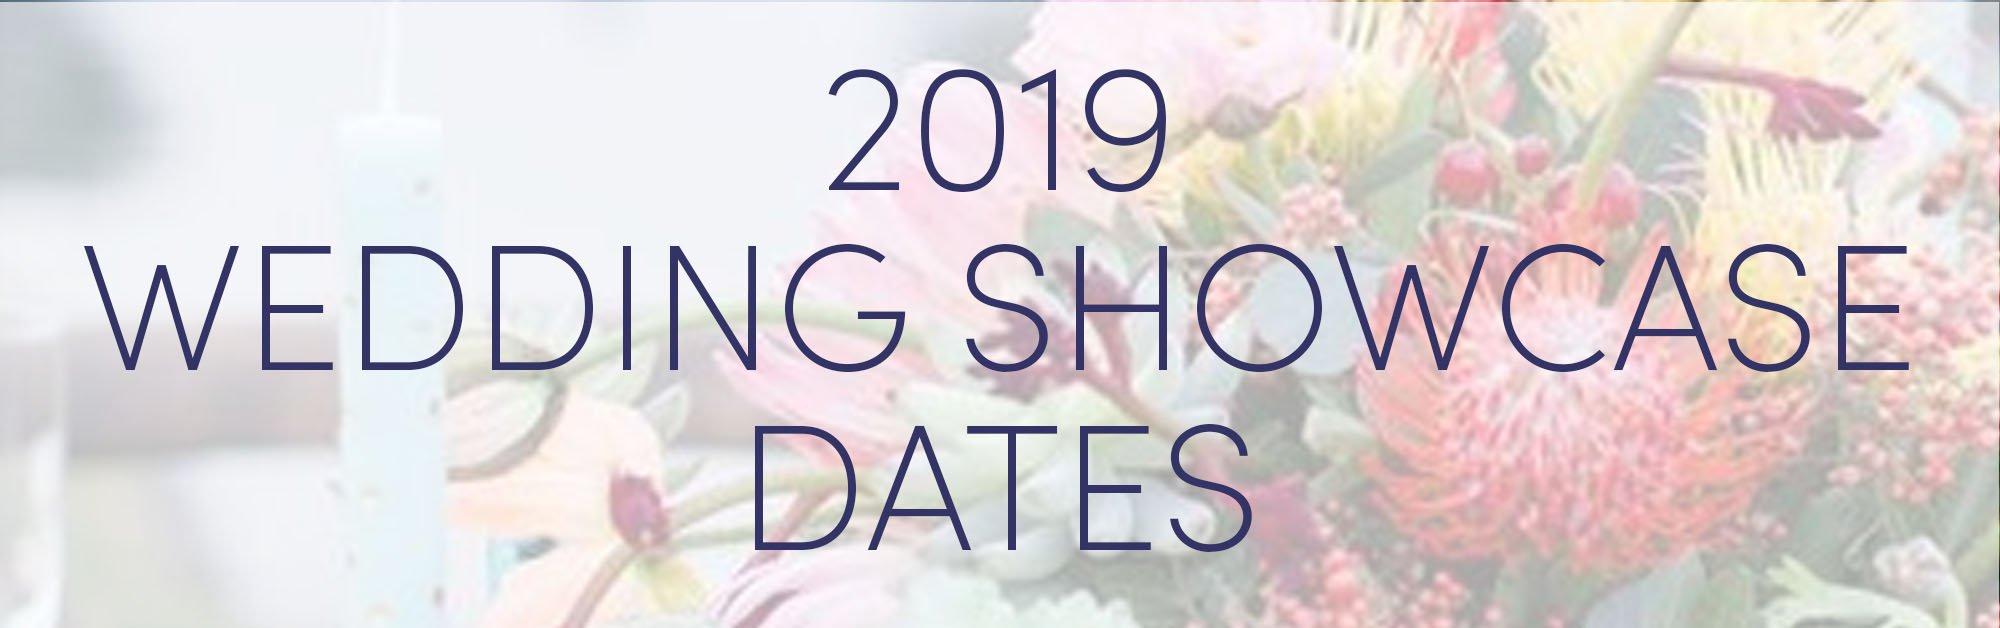 Wedding Showcase Dates 2019 Wedgewood Weddings